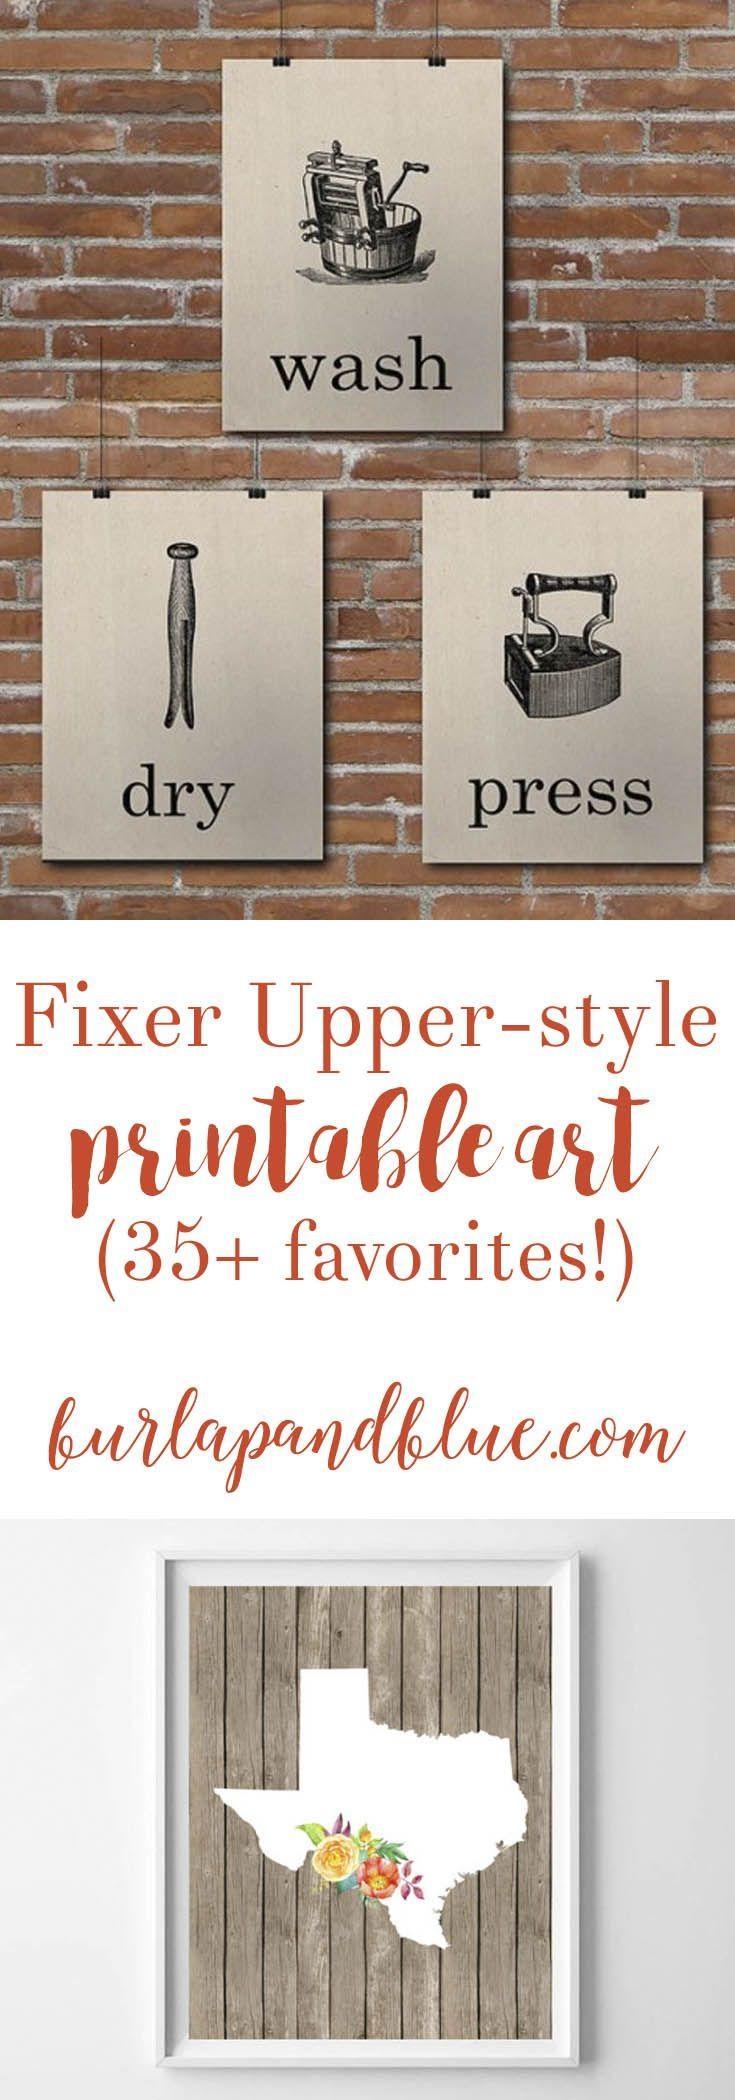 Top 25+ Best Free Printable Art Ideas On Pinterest | Free Art Throughout Farmhouse Wall Art (Image 19 of 20)